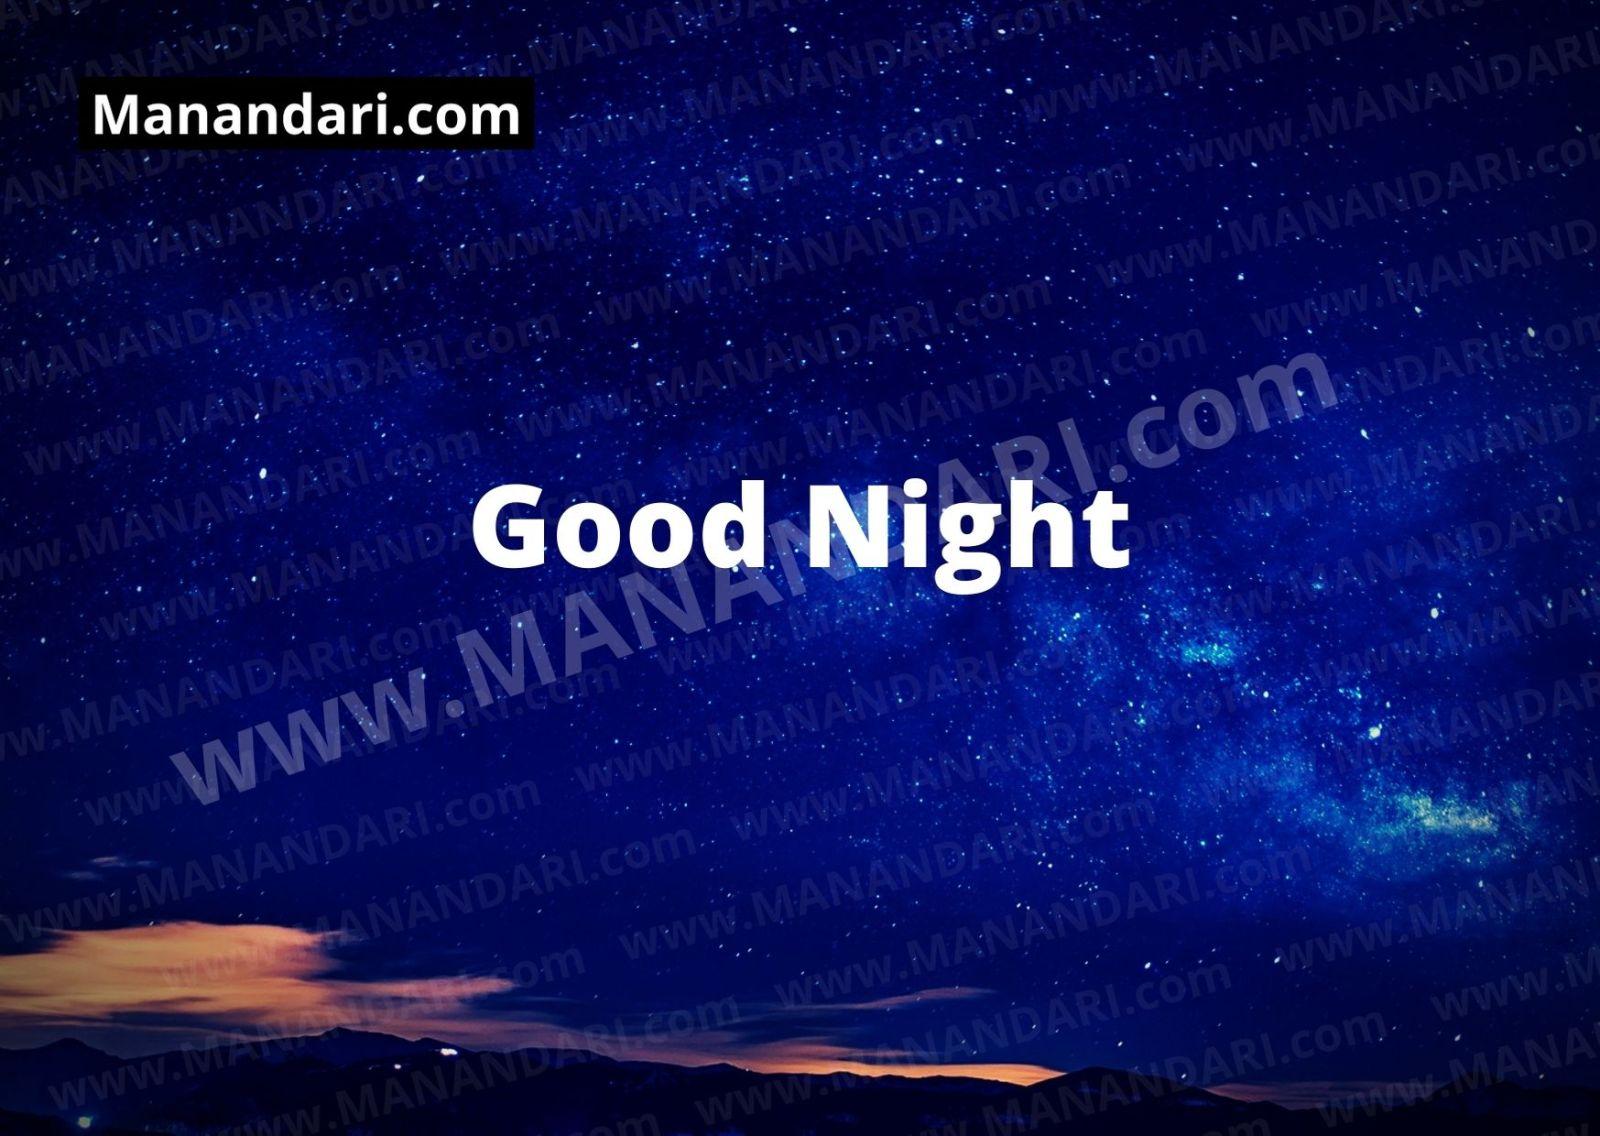 Good Night - 17